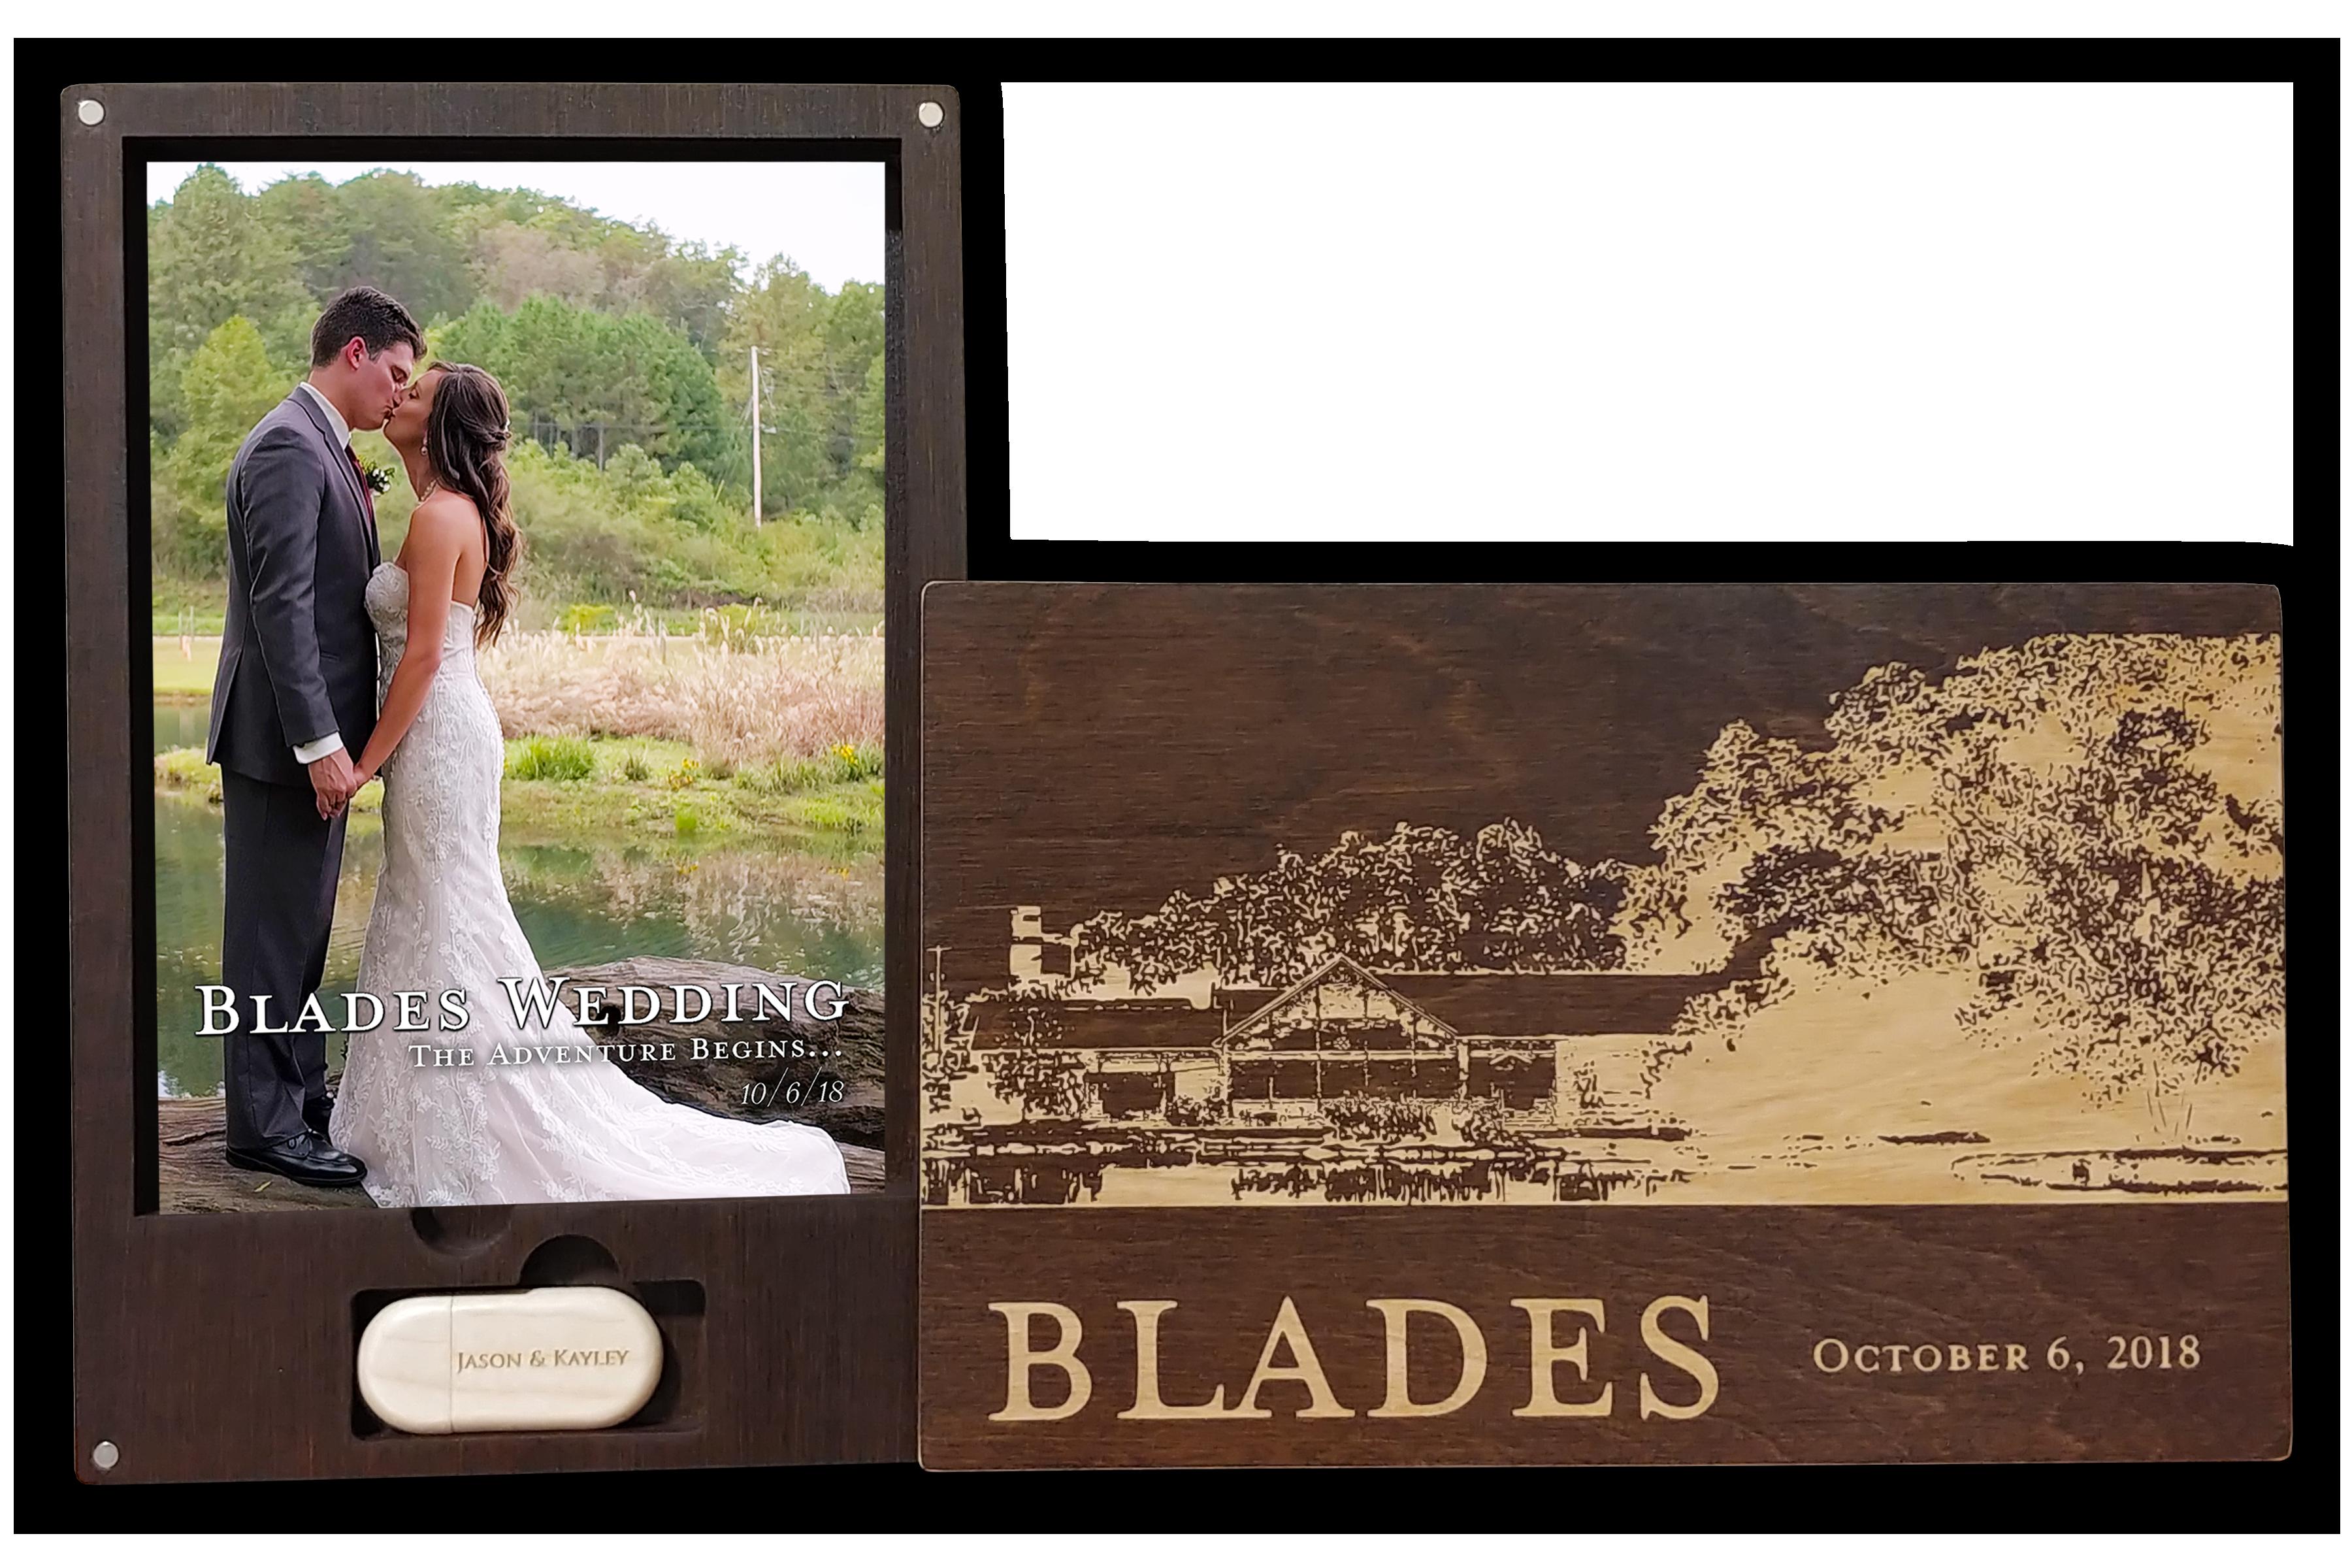 Blades Keepsake Web Pic